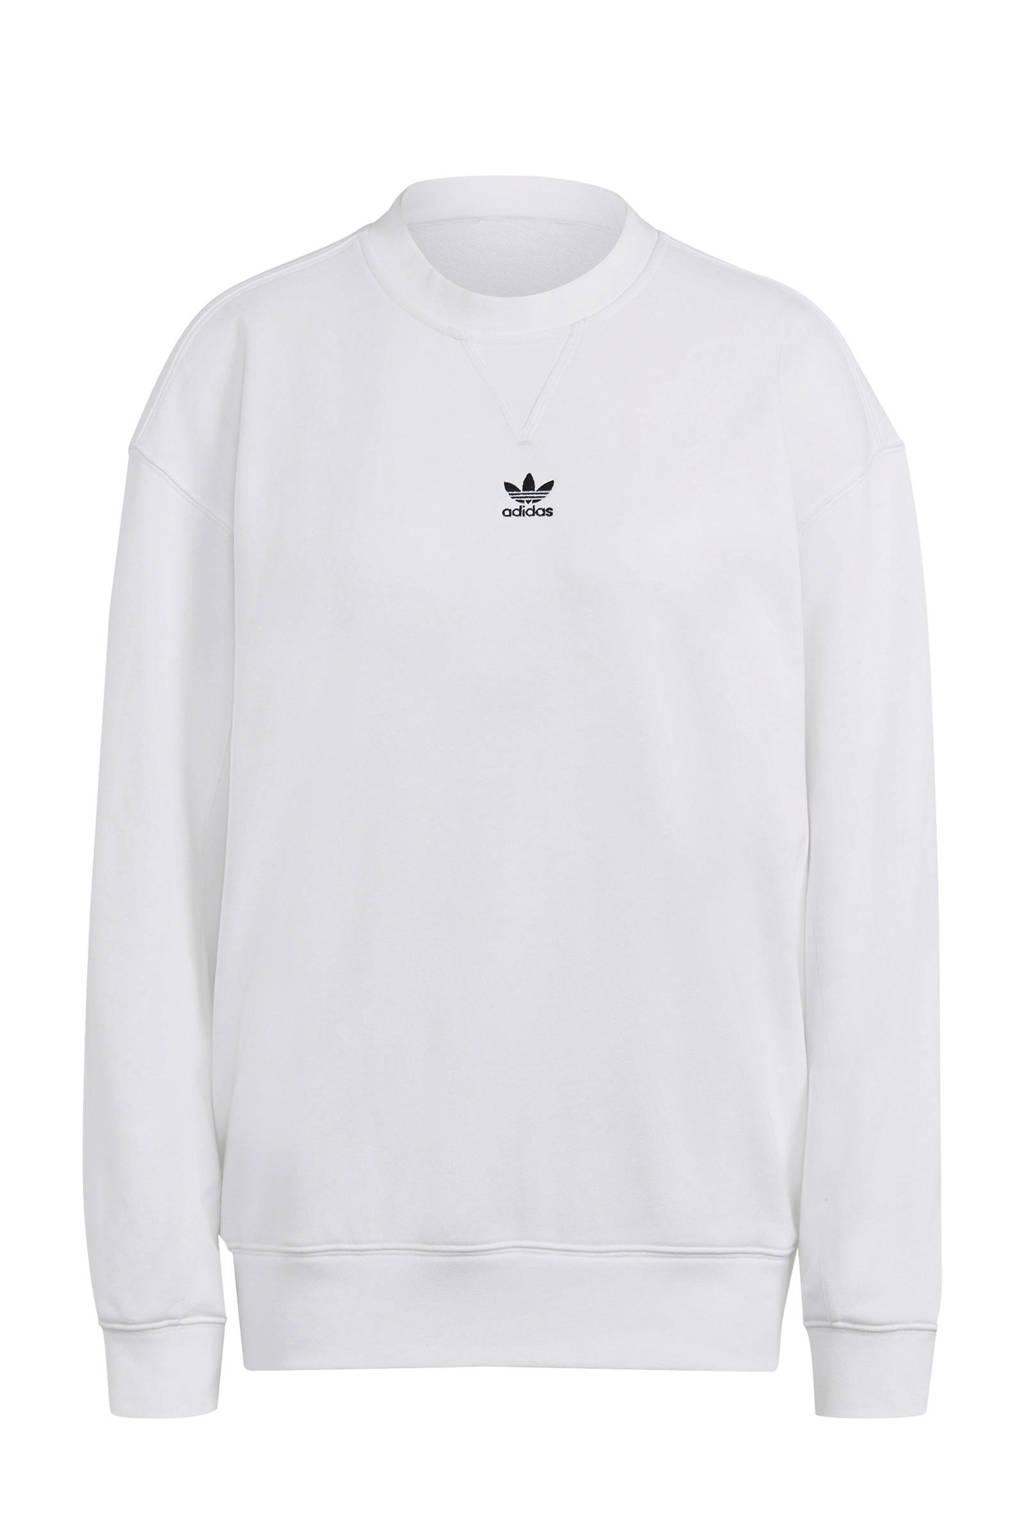 adidas Originals sweater wit, Wit